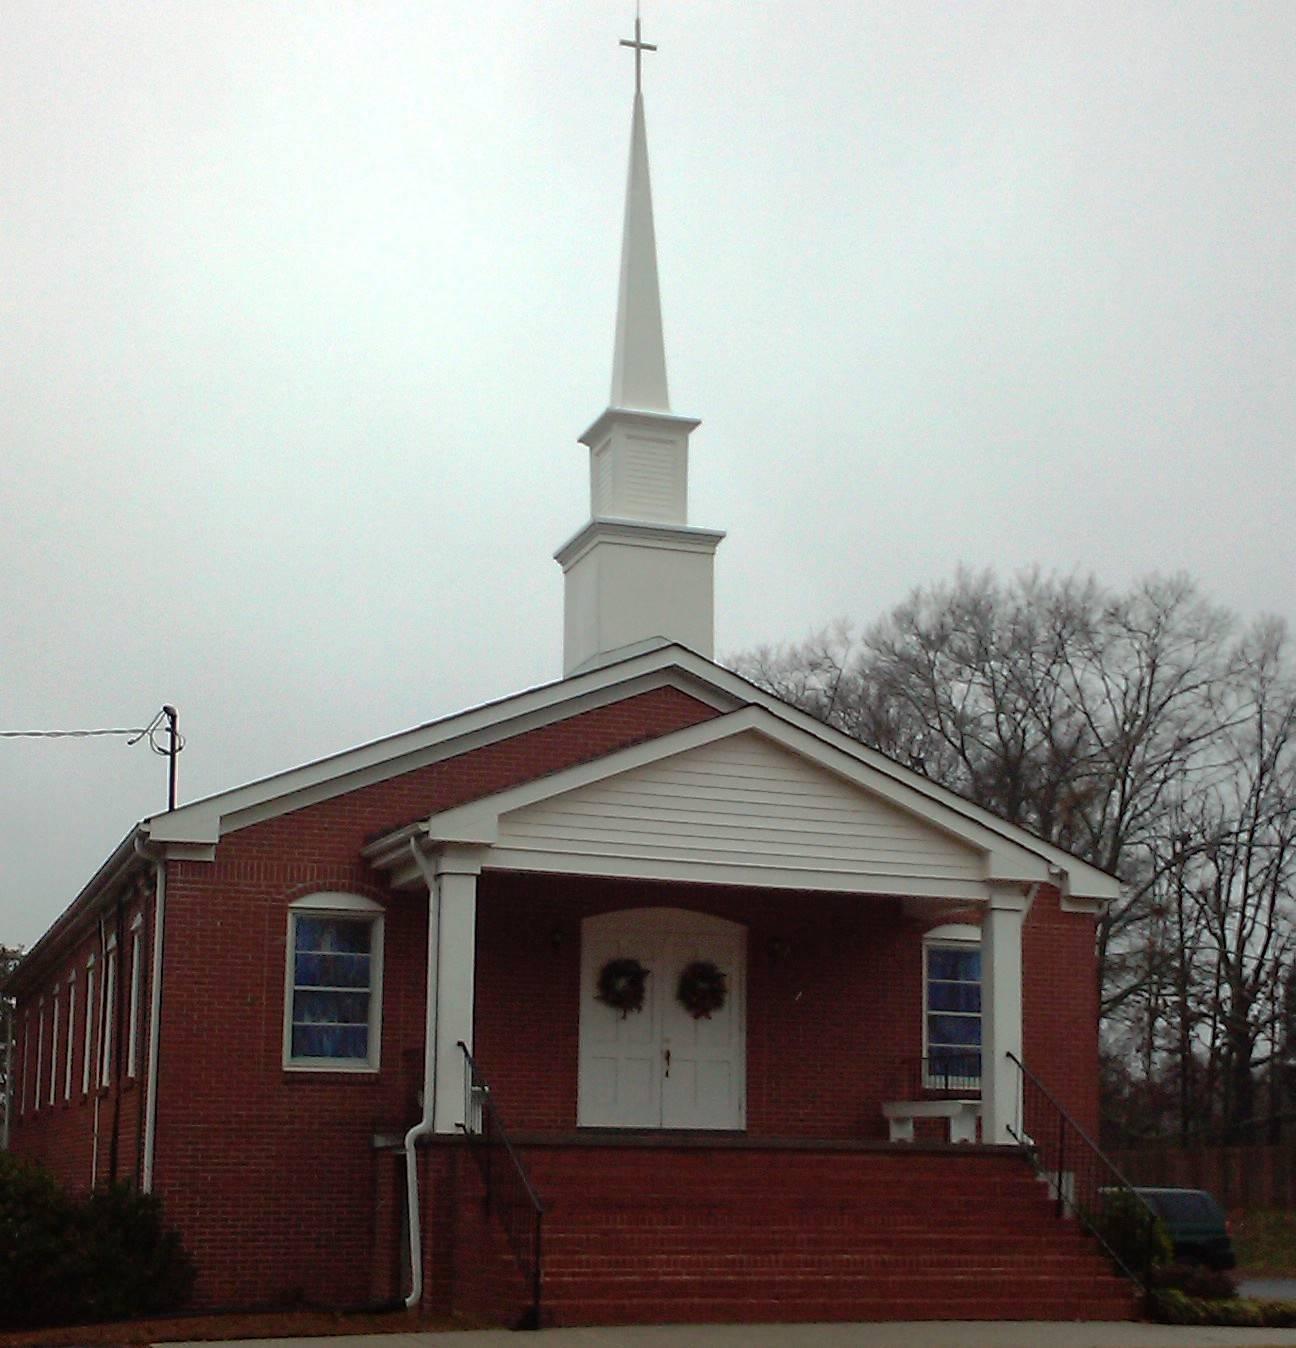 Location, 4050 Austell Powder Springs Road, Powder Springs, Georgia, 30127, United States